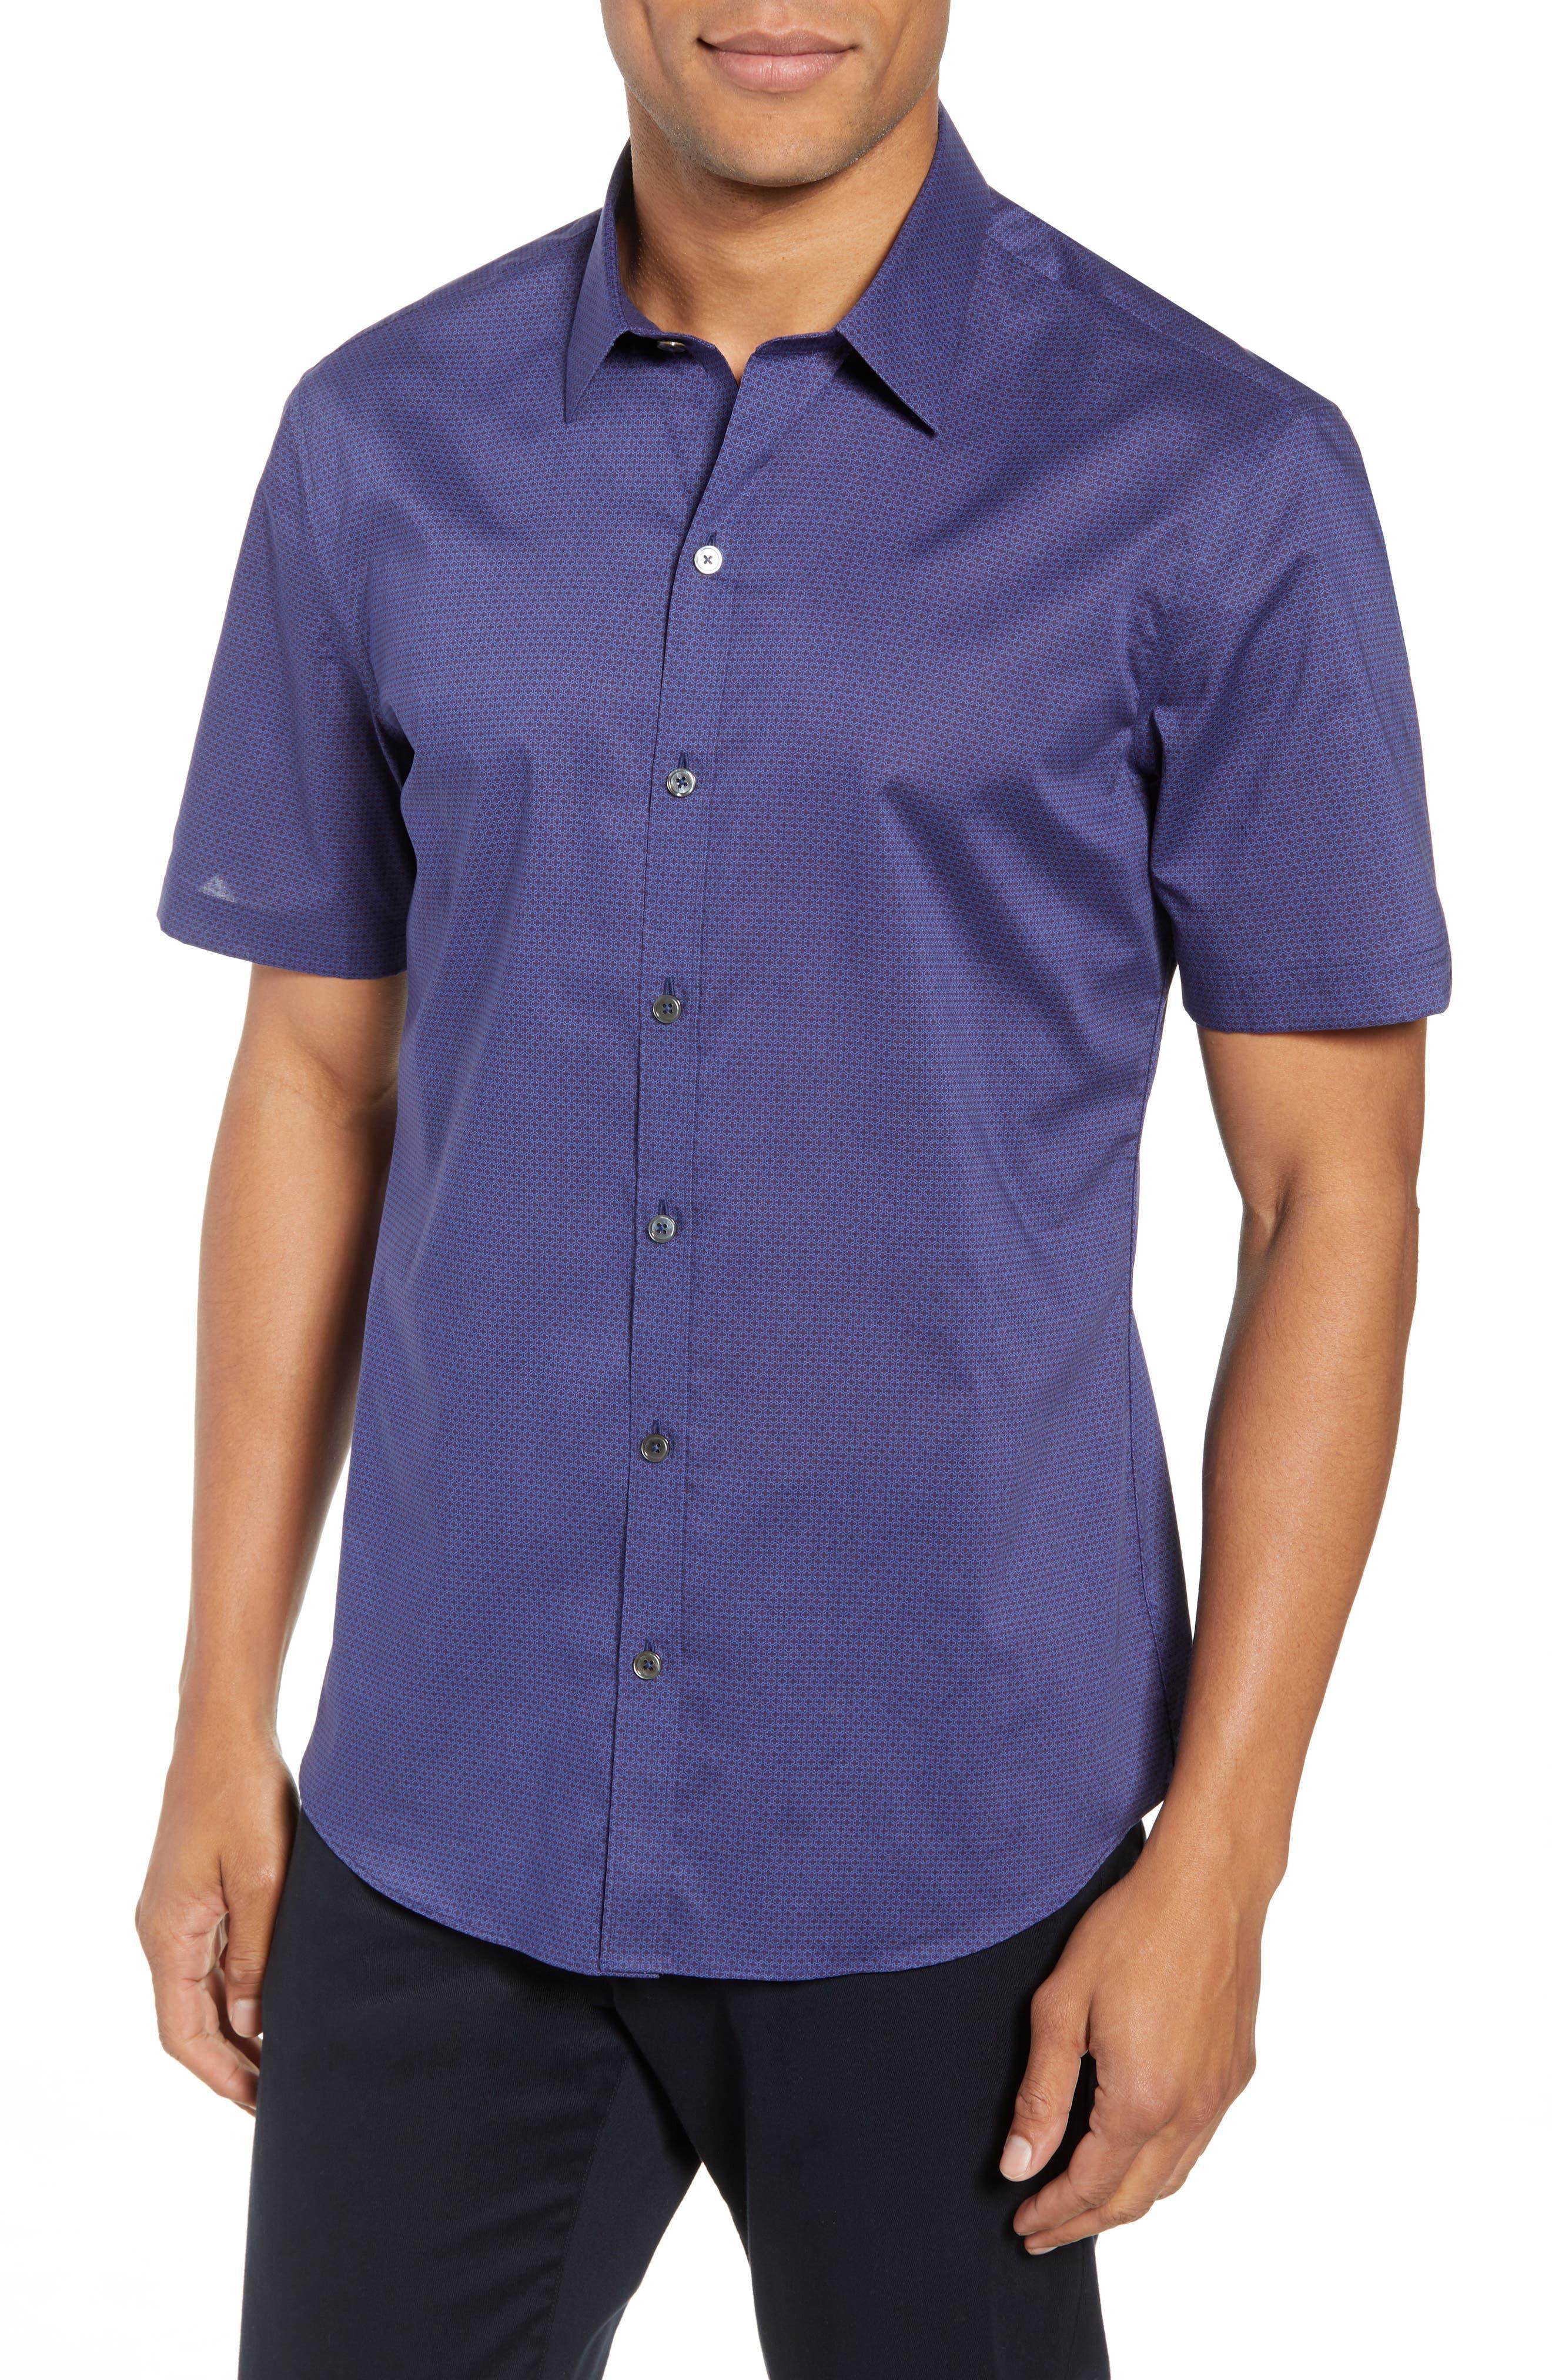 Avellan Regular Fit Sport Shirt,                         Main,                         color, BLUE